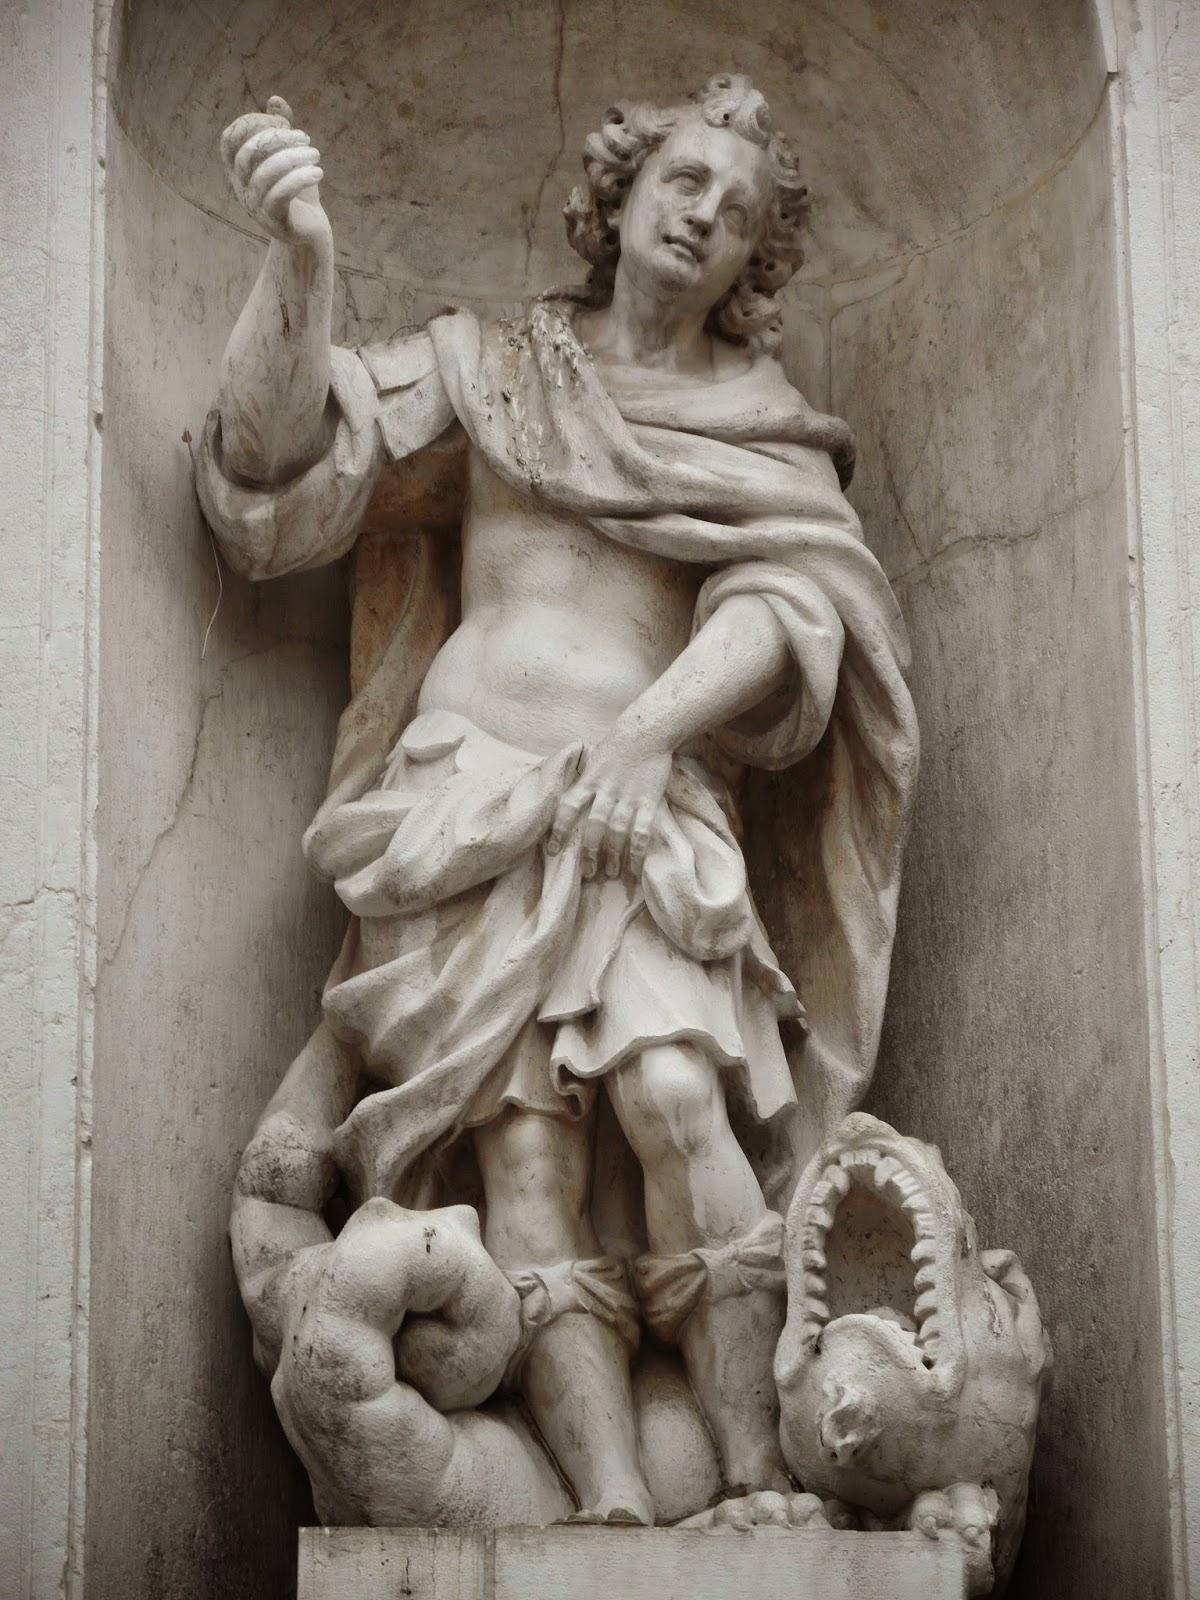 A statue of San Teodoro, the church of San Tomà, Venice